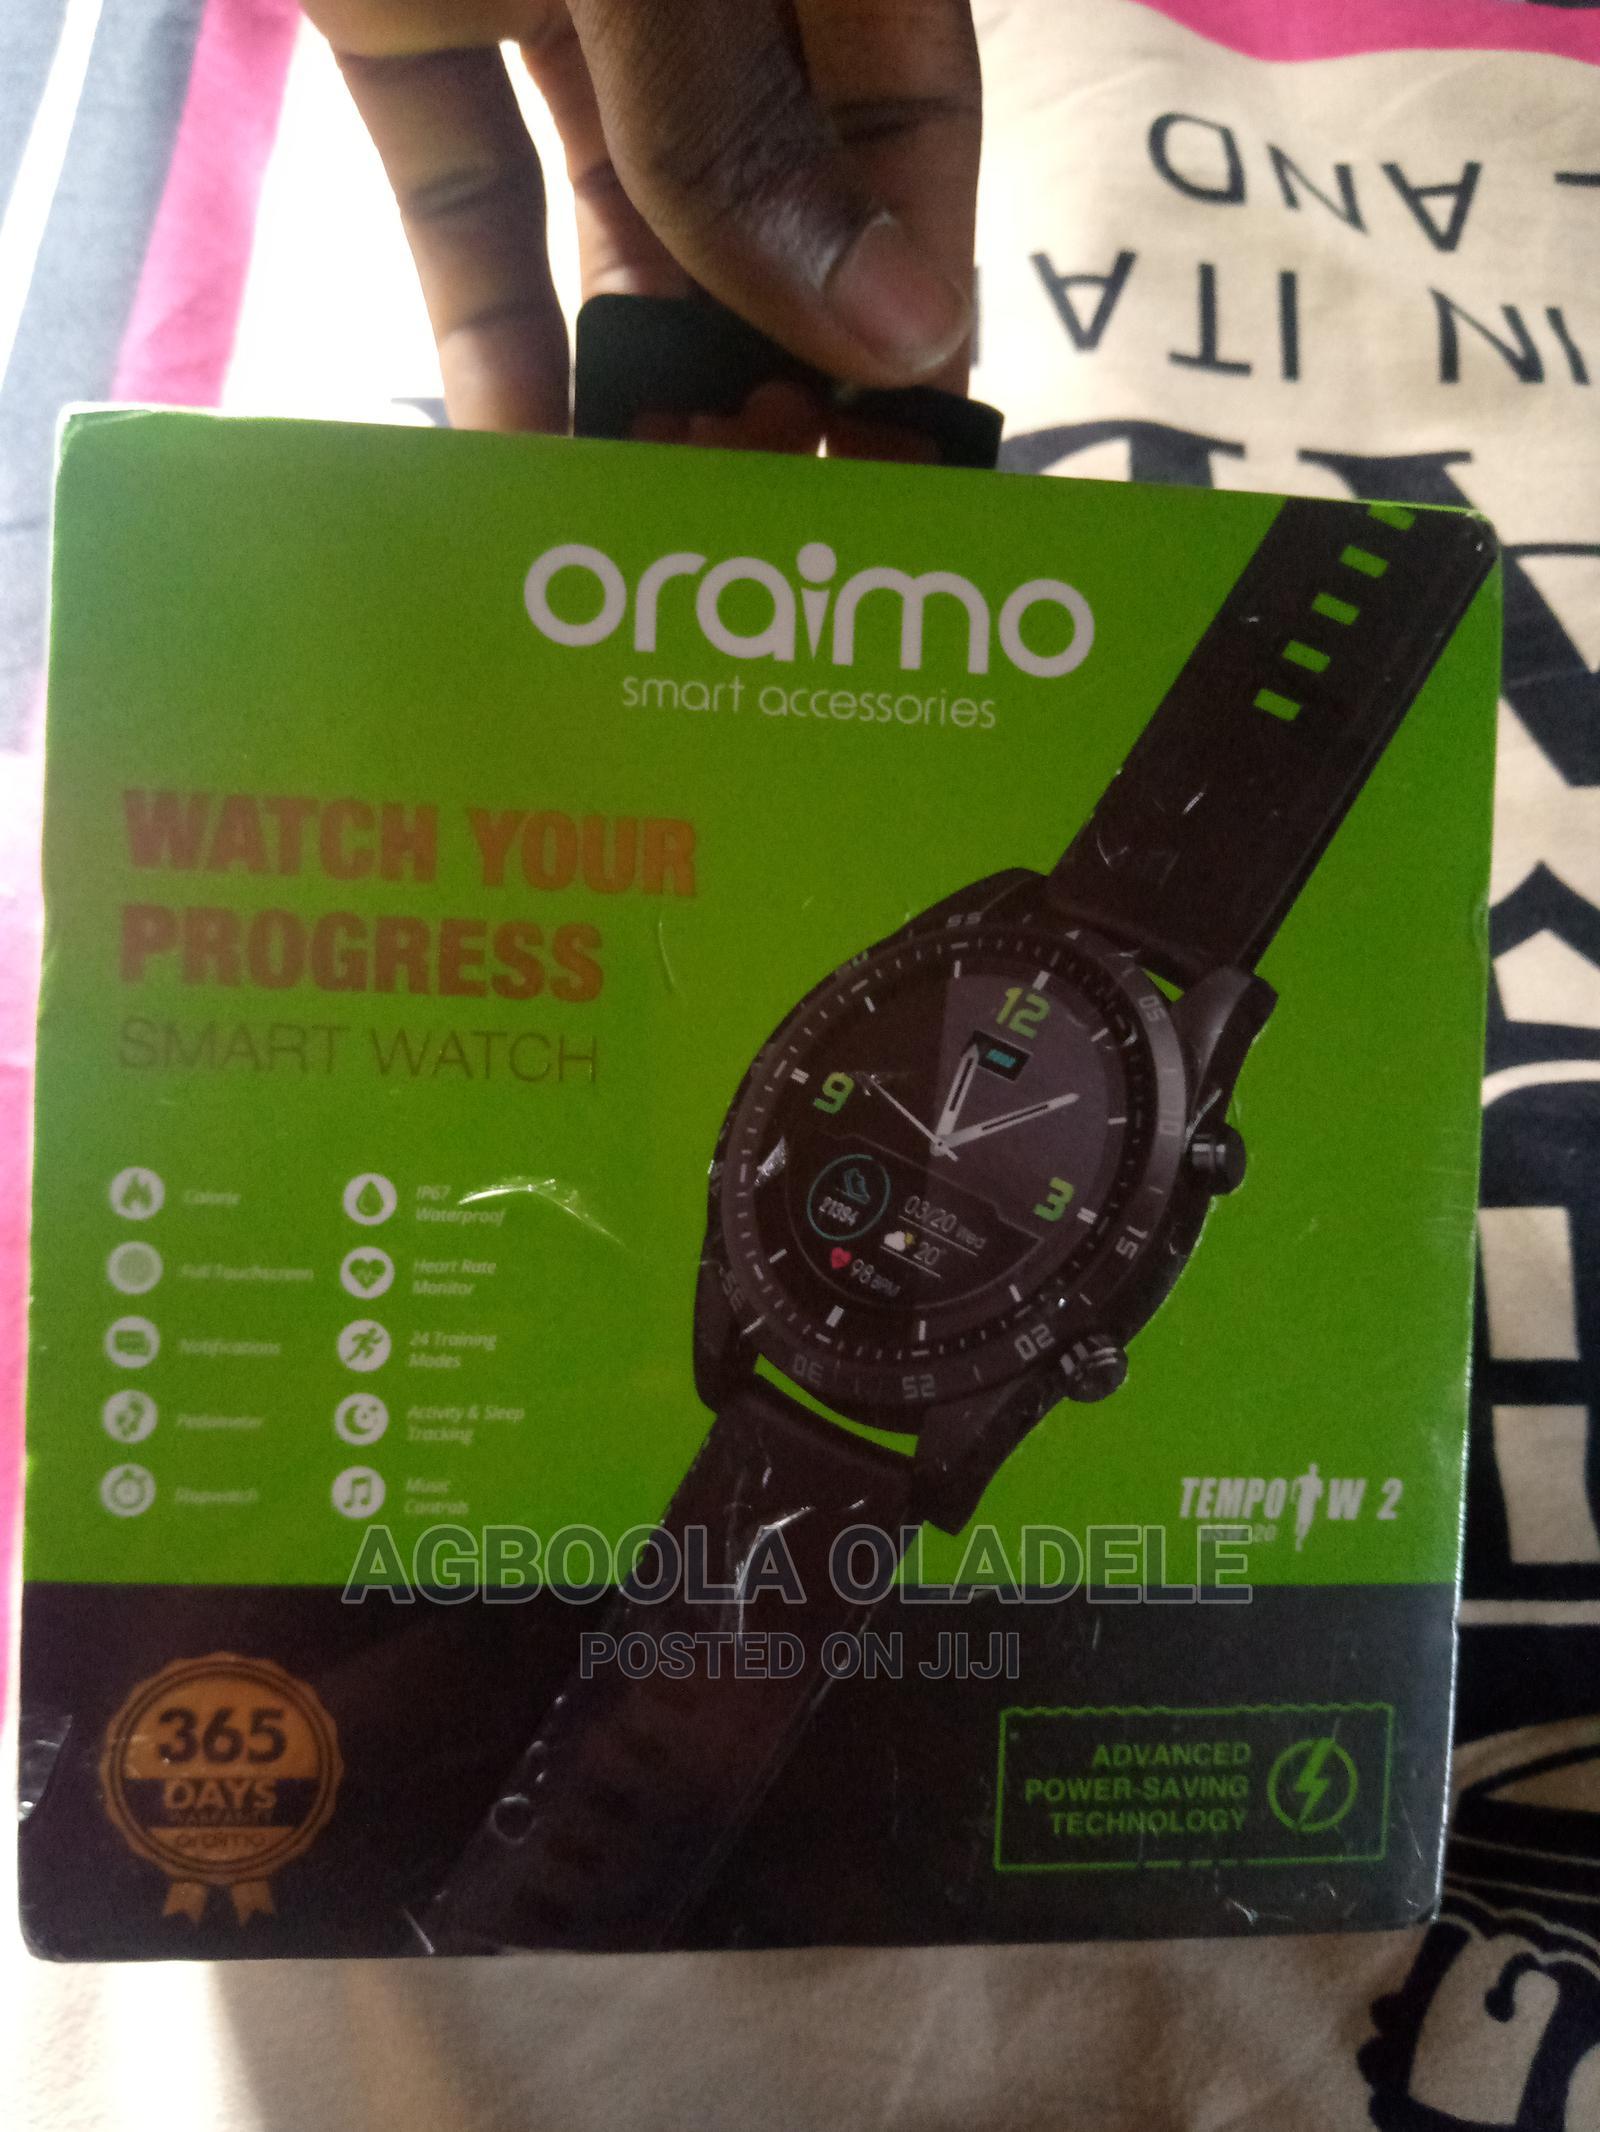 Archive: New Oraimo Smart Watch